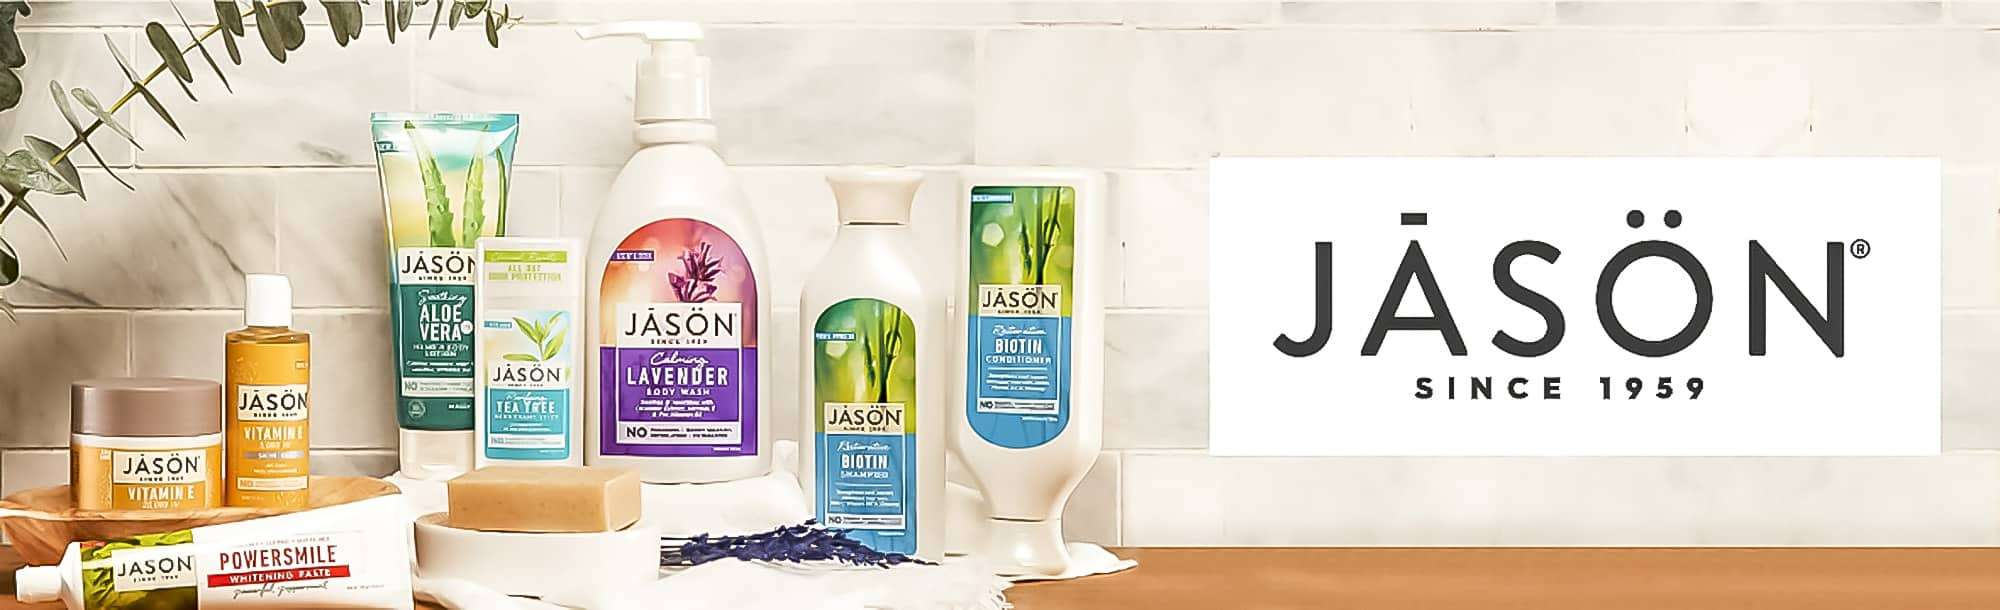 Productos JASON